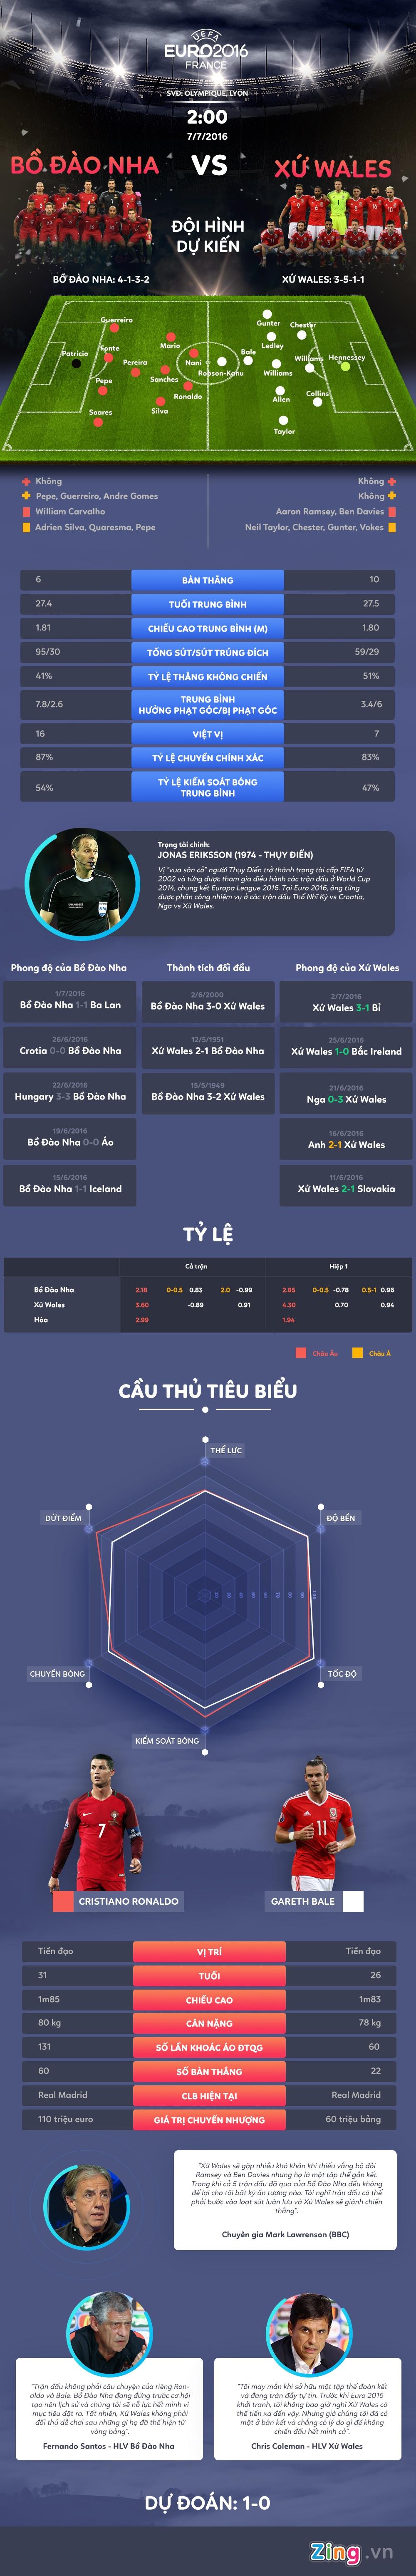 Bo Dao Nha vs Xu Wales: Dai chien Ronaldo - Bale hinh anh 1